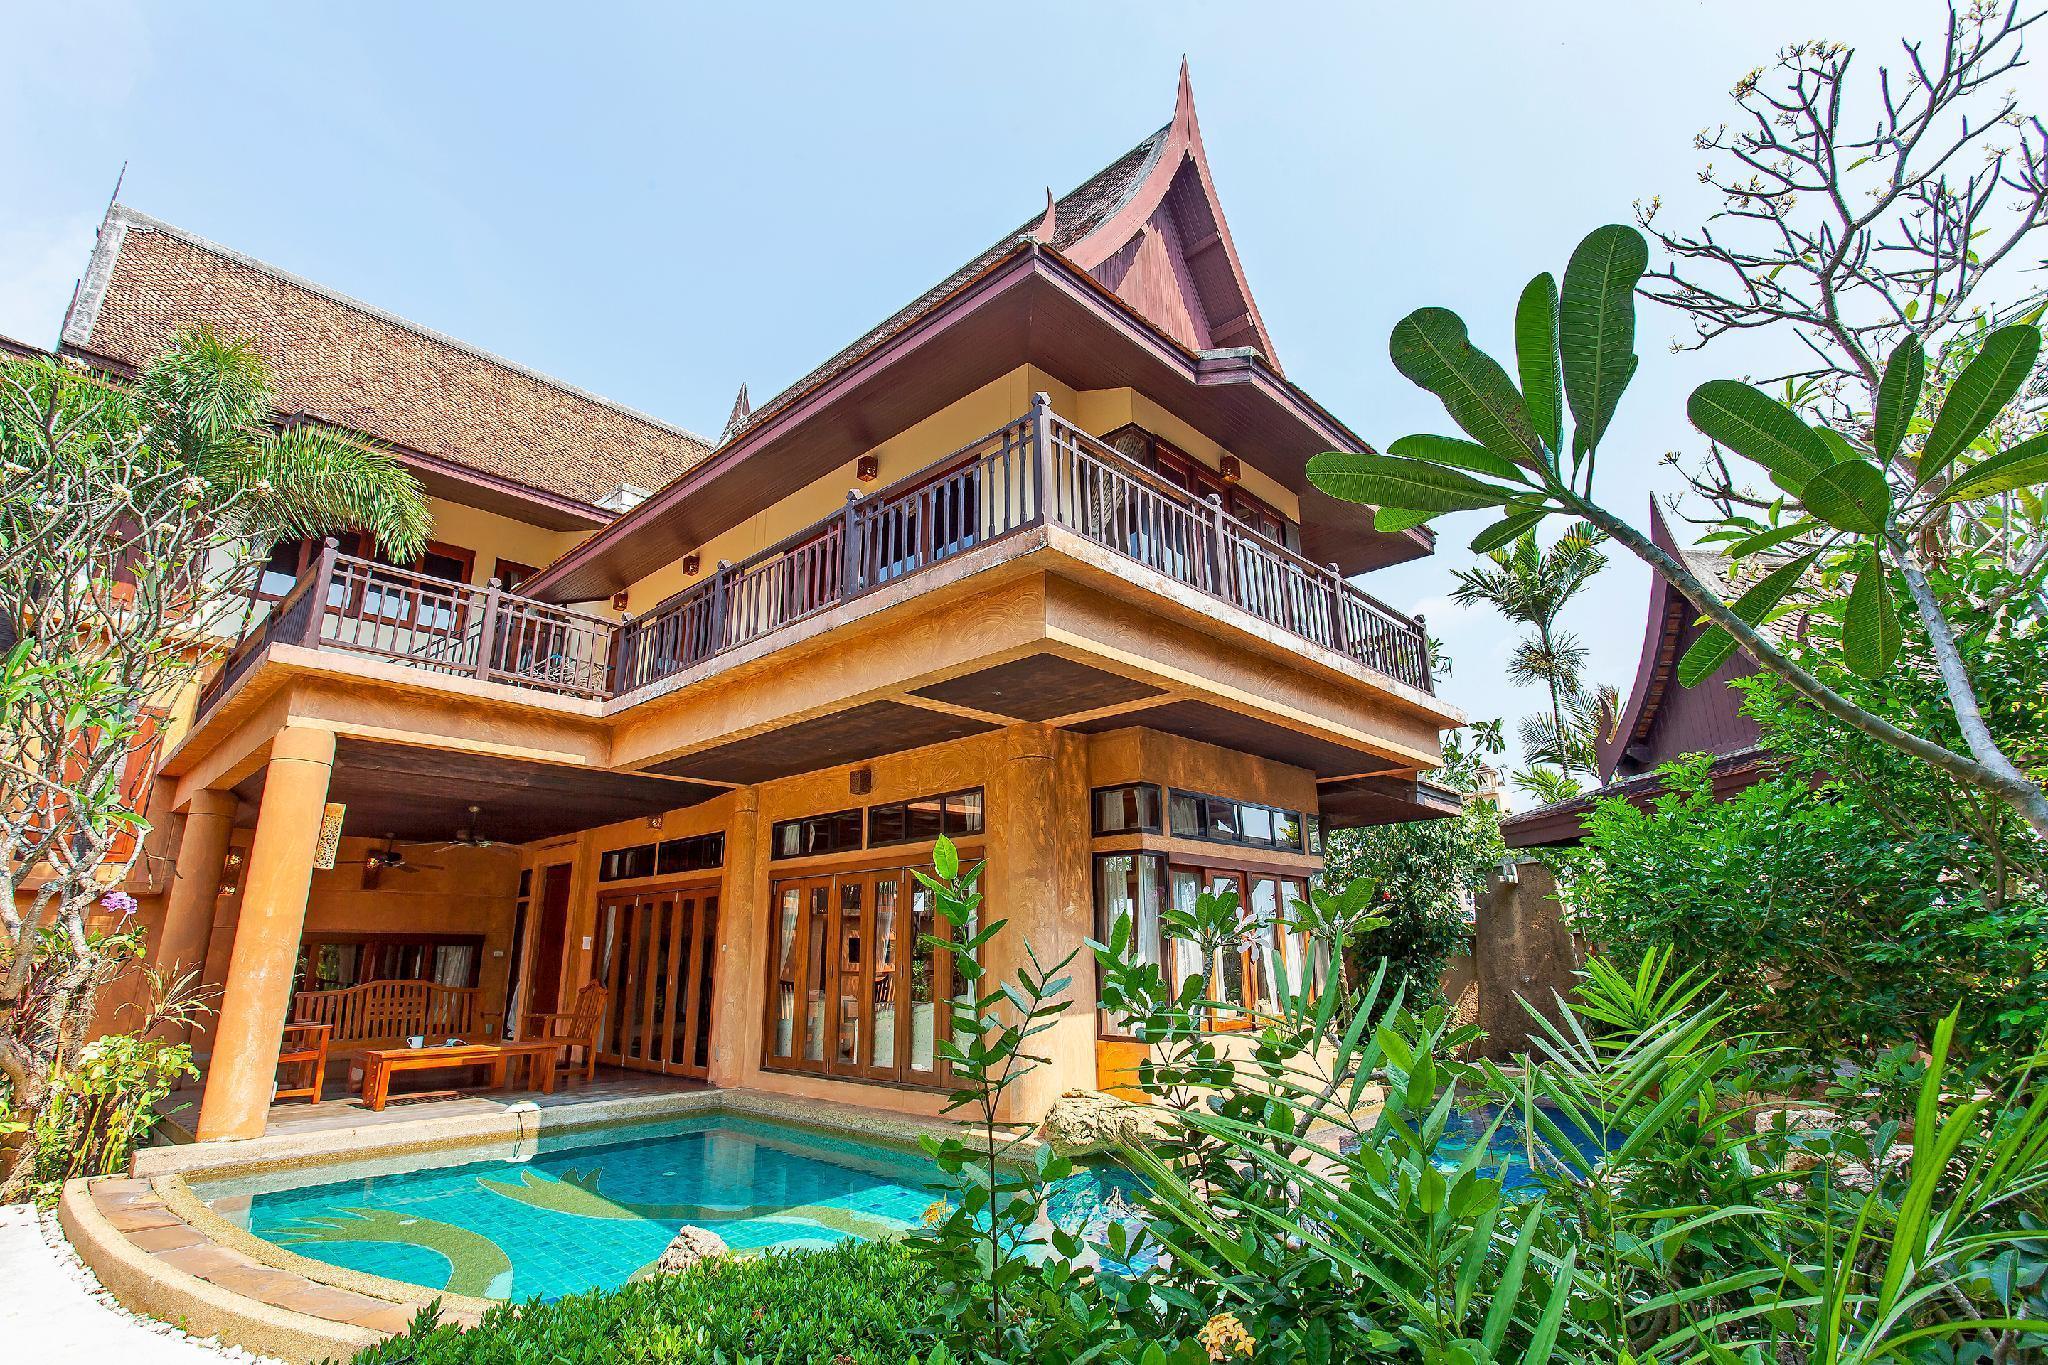 Lotus Breeze | 4BR Traditional Thai Villa, Jomtien วิลลา 4 ห้องนอน 5 ห้องน้ำส่วนตัว ขนาด 240 ตร.ม. – นาจอมเทียน